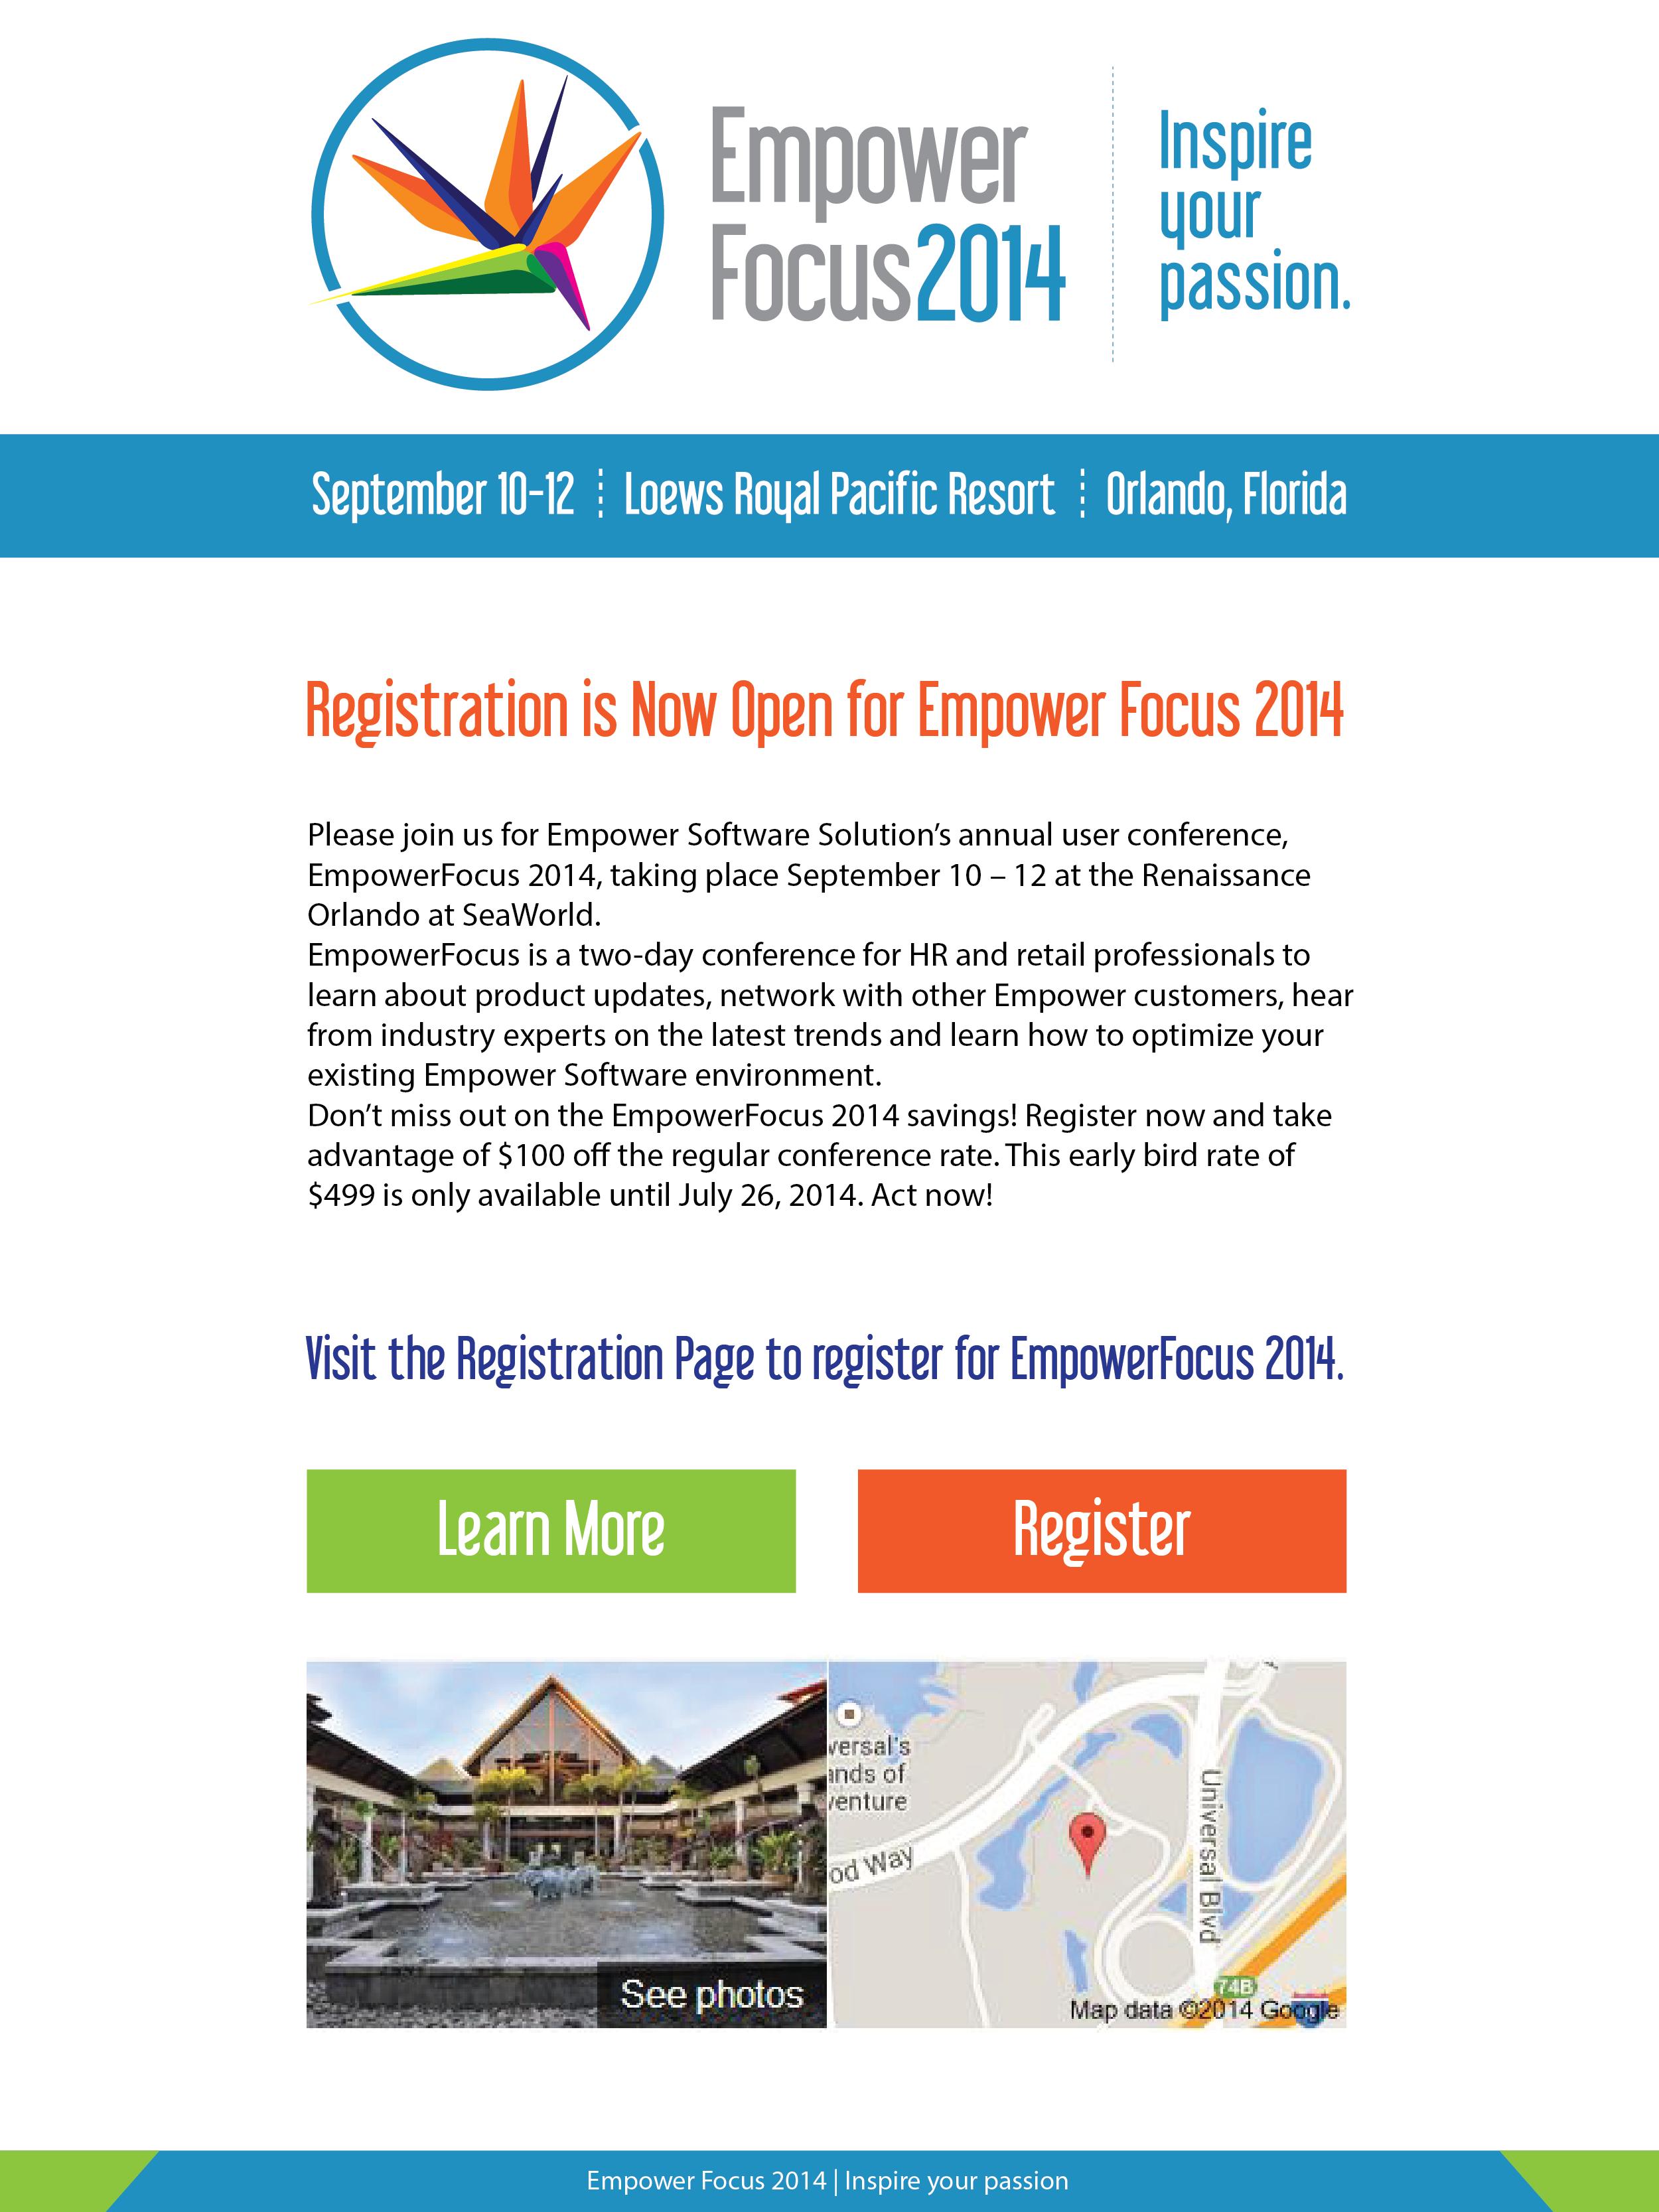 EmpowerFocus 2014 Theme Materials